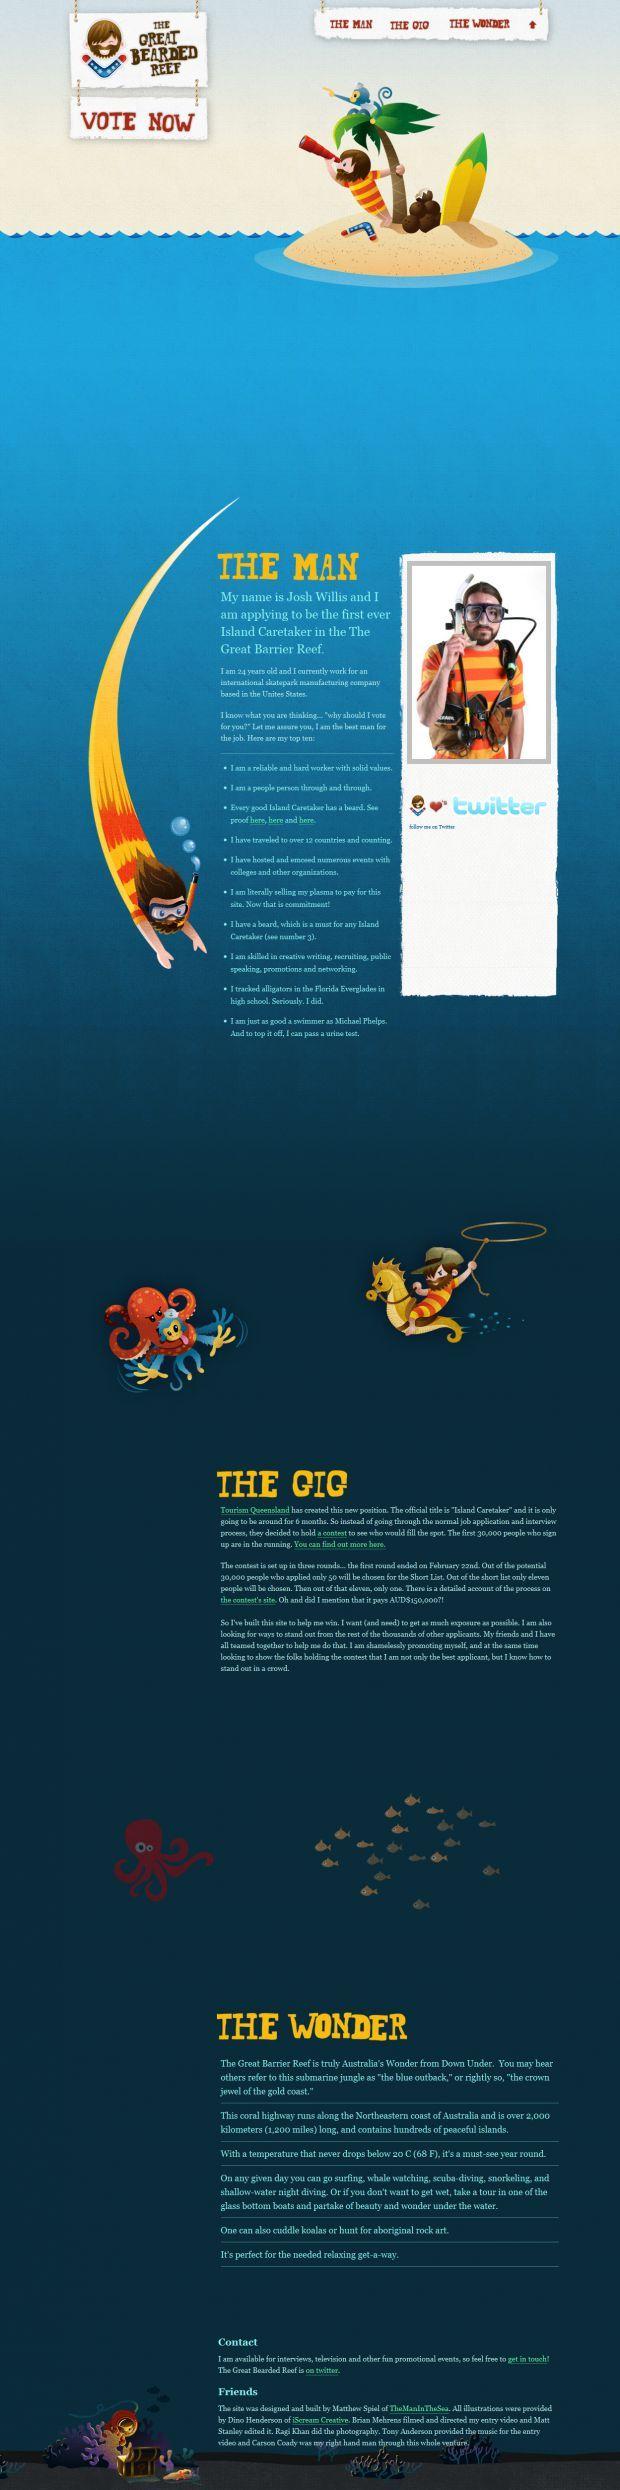 Unique Web Design, The Great Bearded Reef #WebDesign #Design (http://www.pinterest.com/aldenchong/)